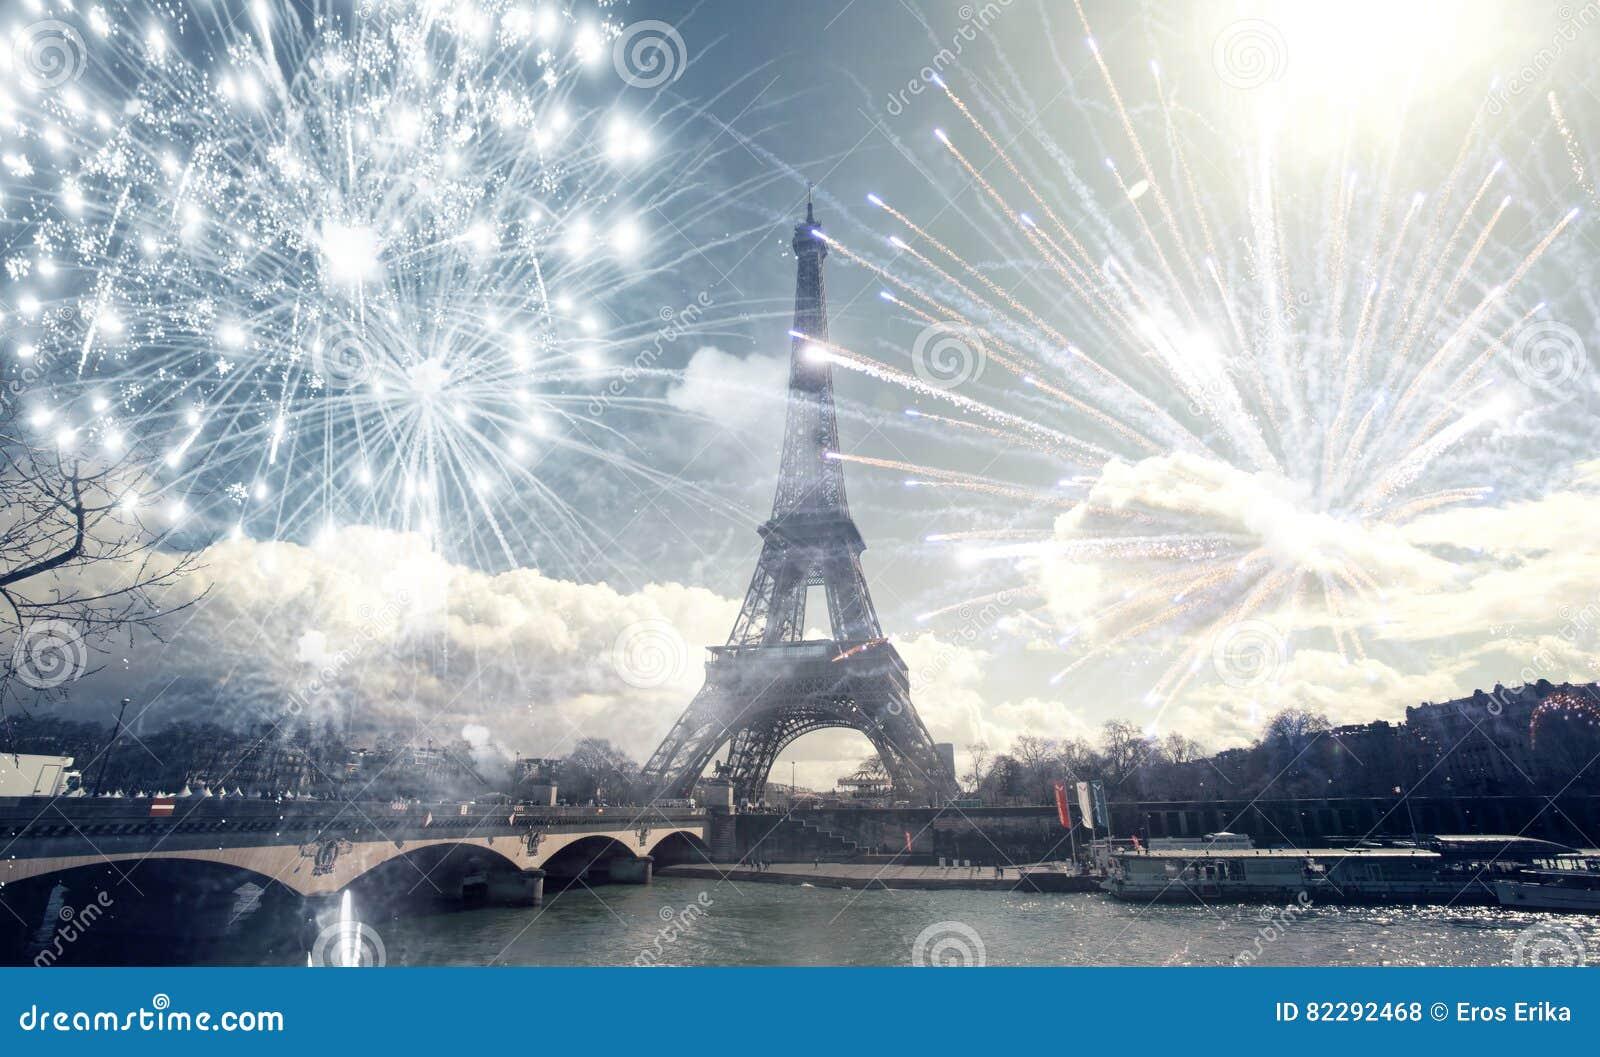 Эйфелева башня Париж, Франция с фейерверками